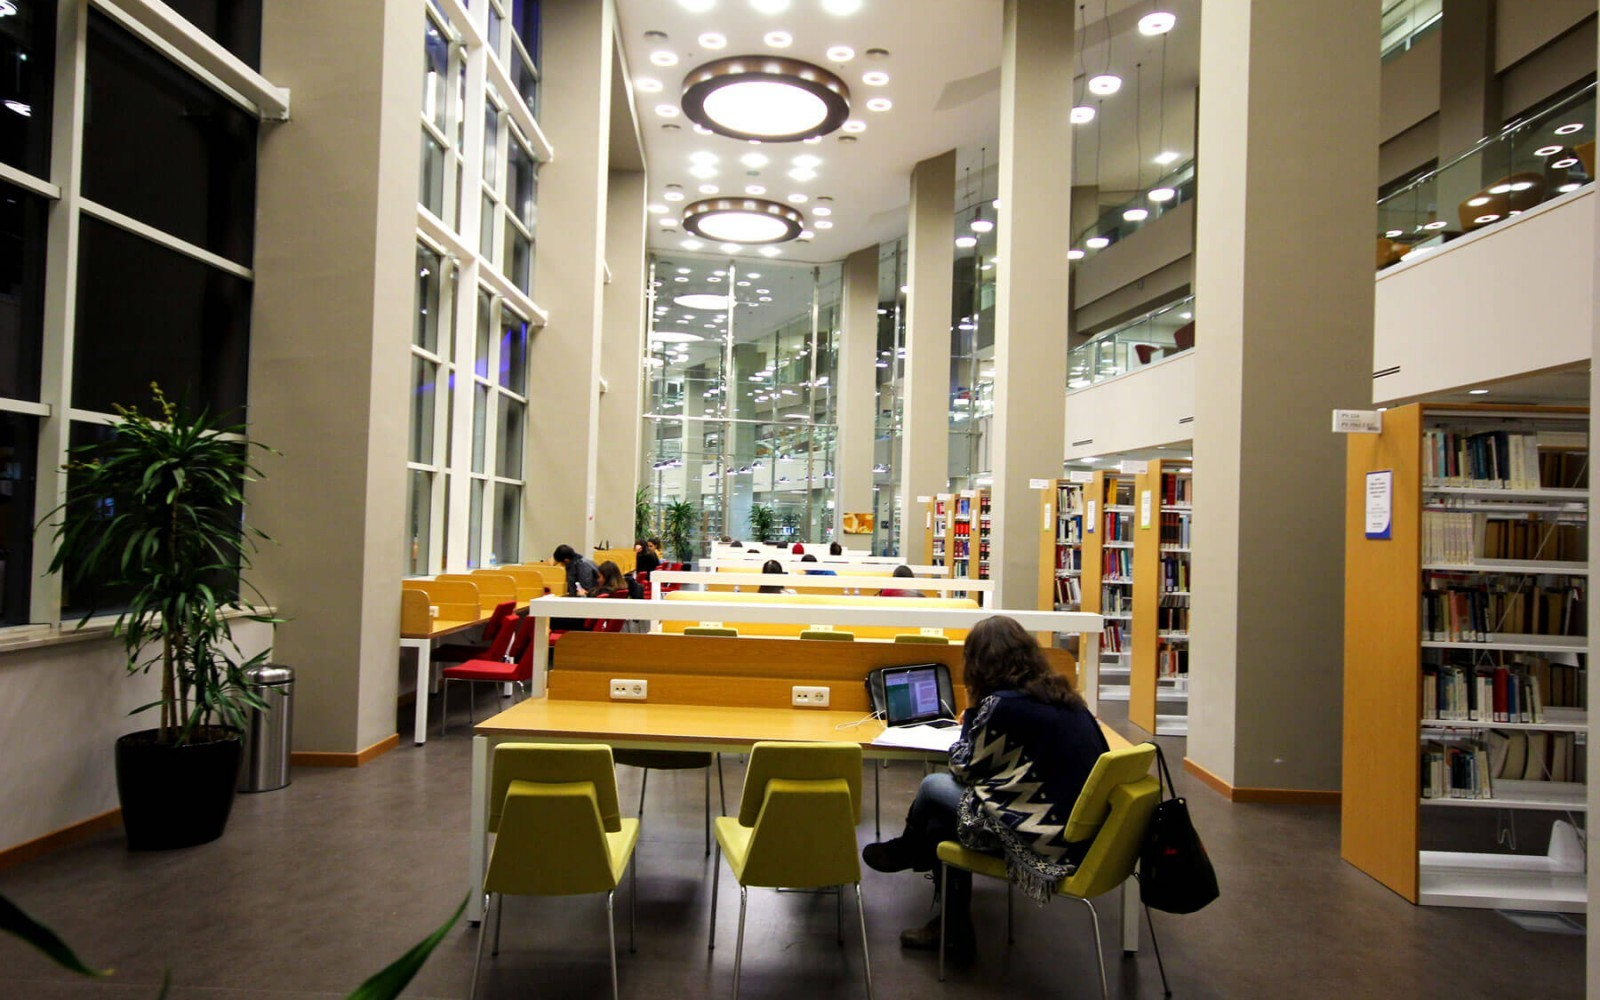 Atılım University Library